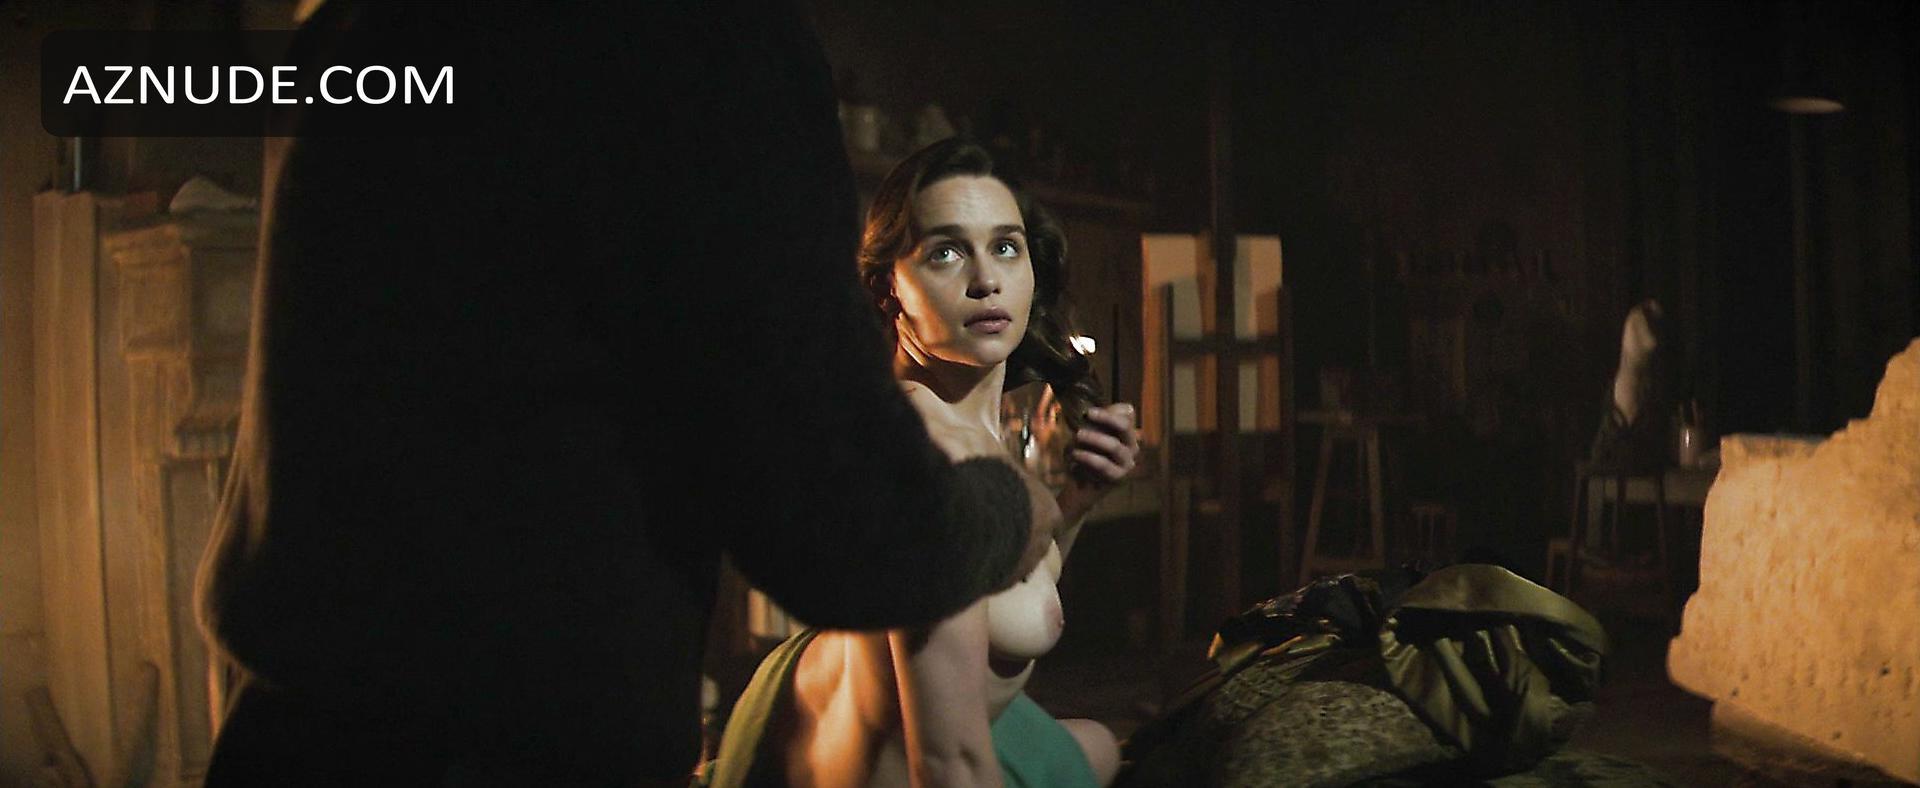 Emilia clarke aznude